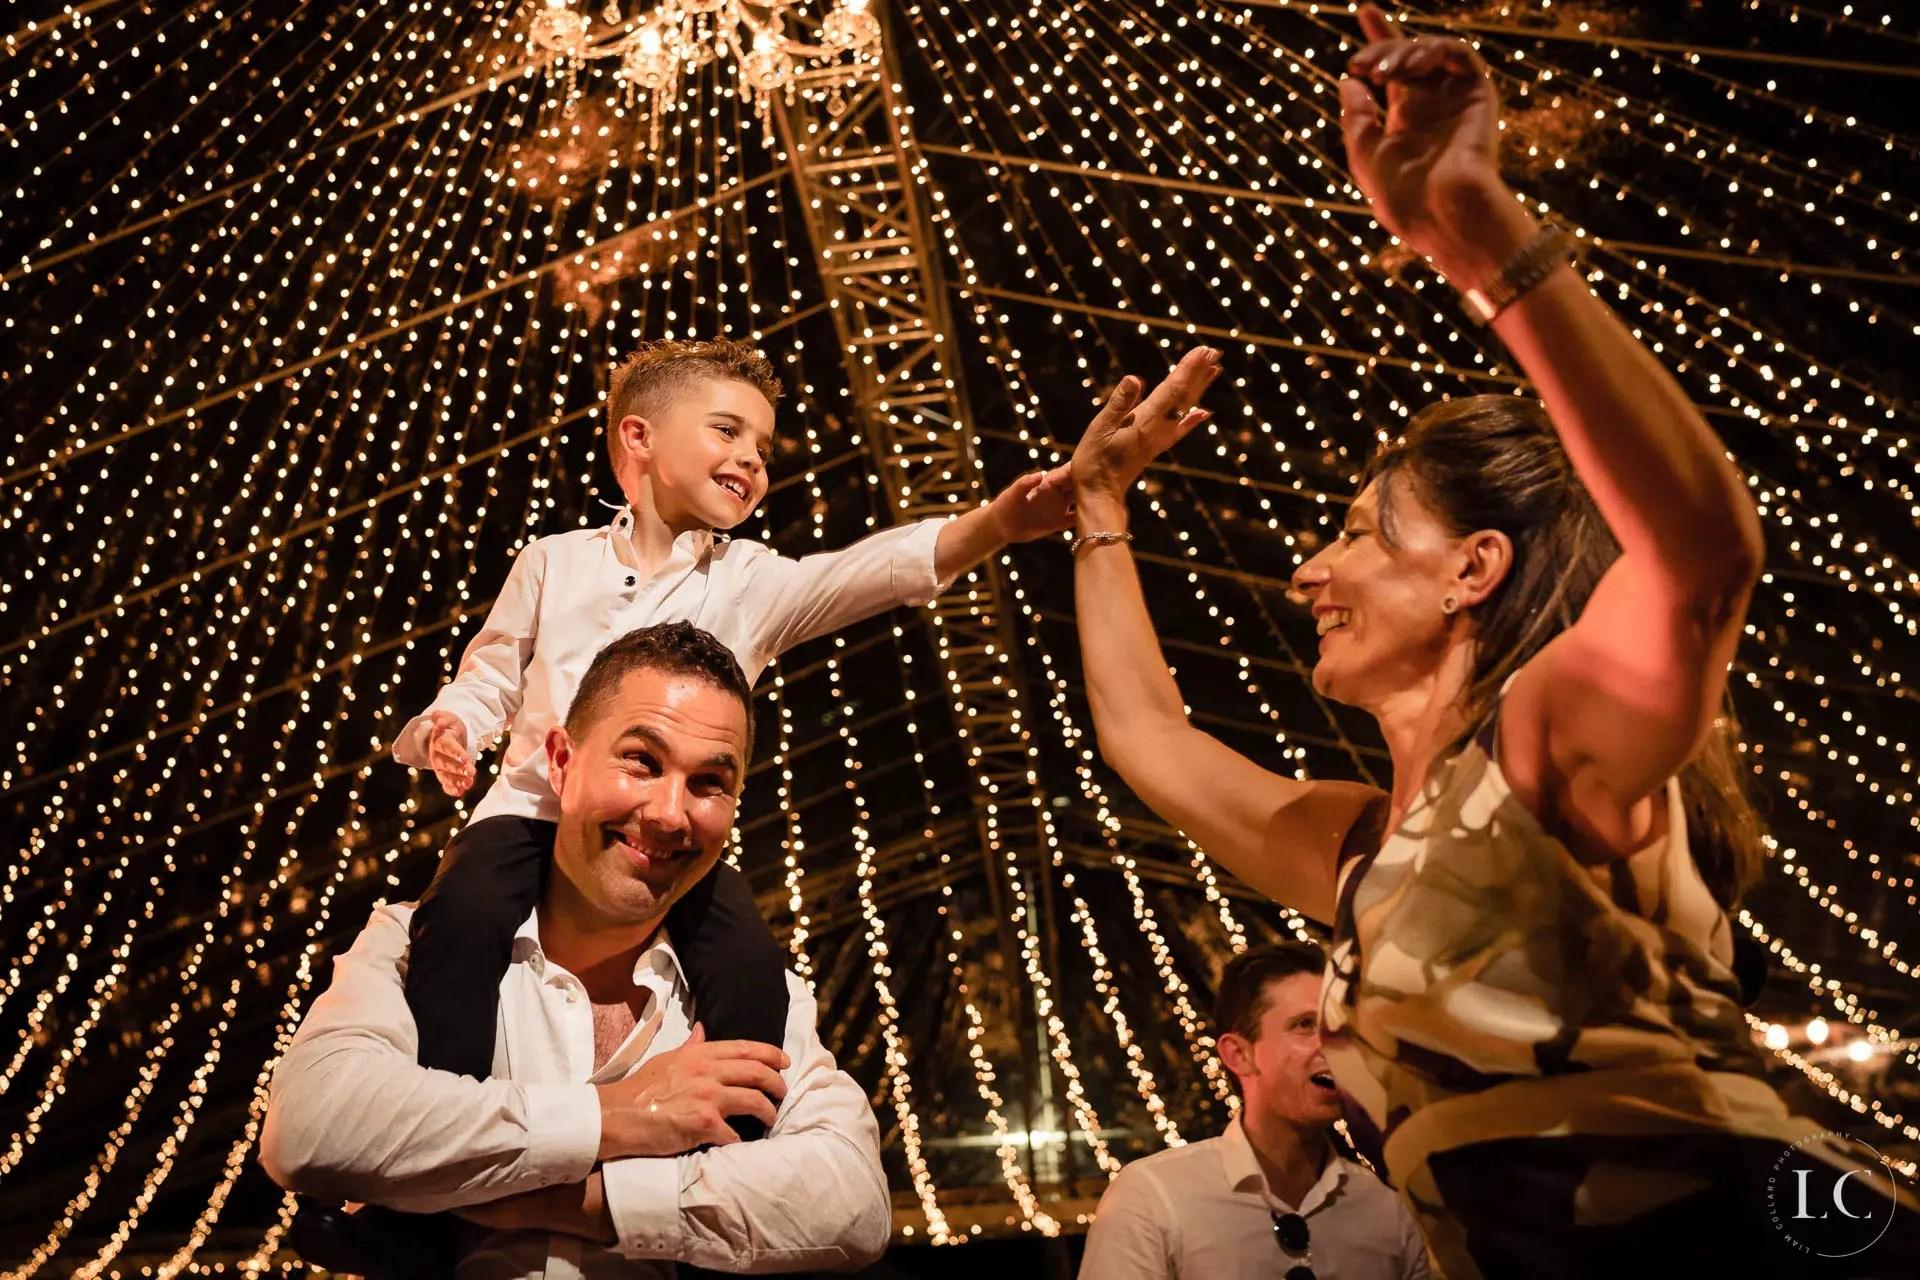 Child on man's shoulders at wedding